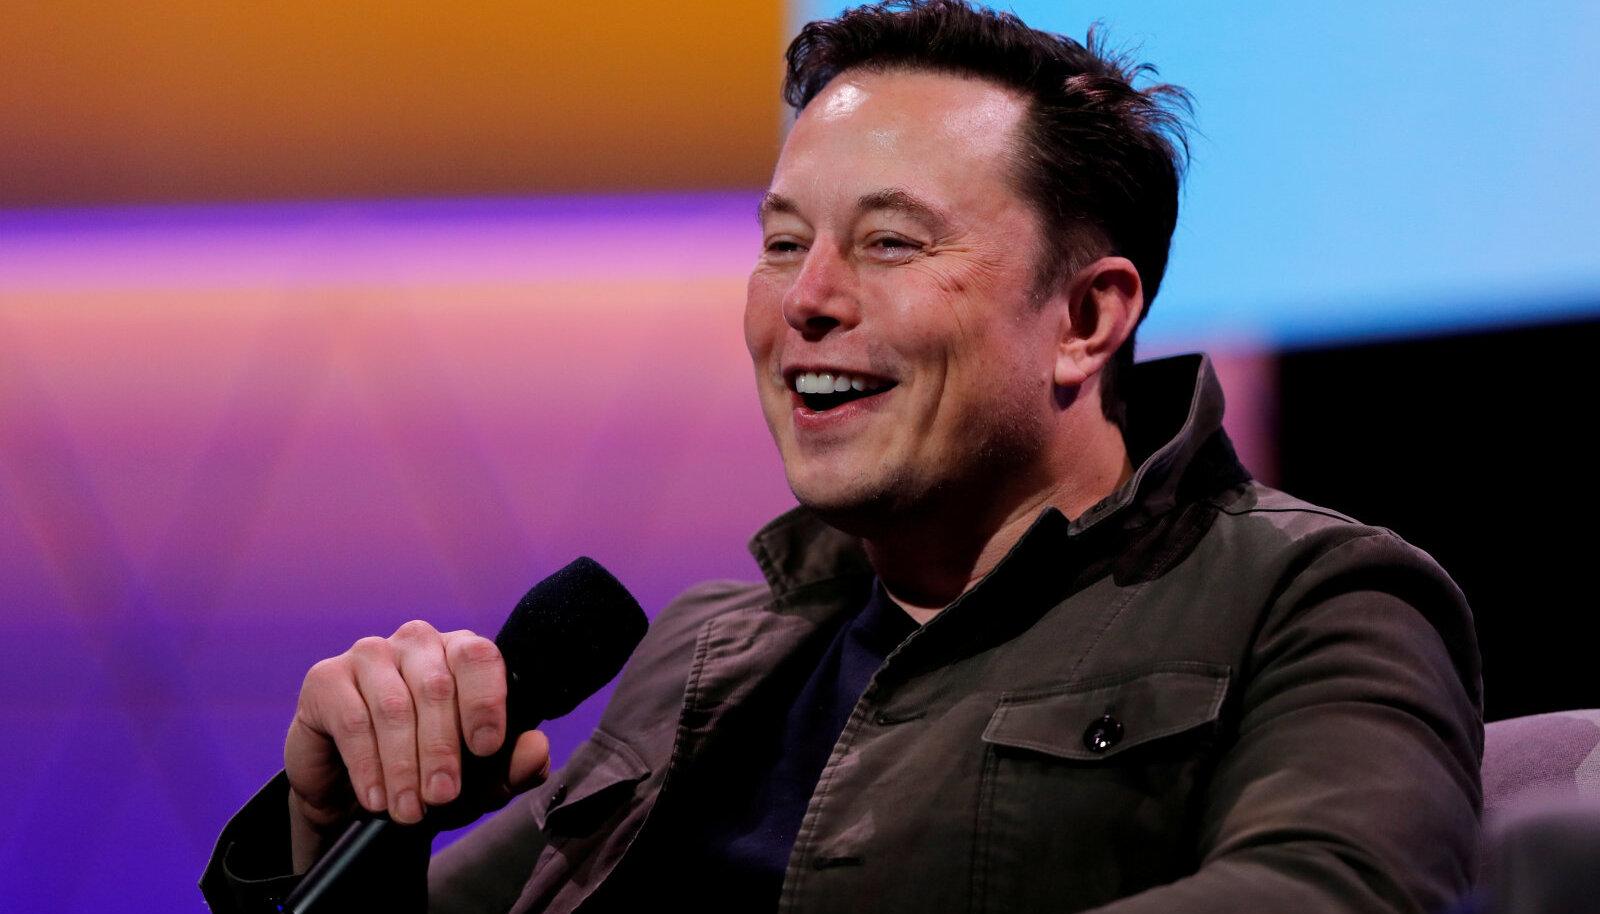 Hiinlaste uus rahvakangelane Elon Musk oma nerdy chic'i demonstreerimas (foto: REUTERS / Scanpix)